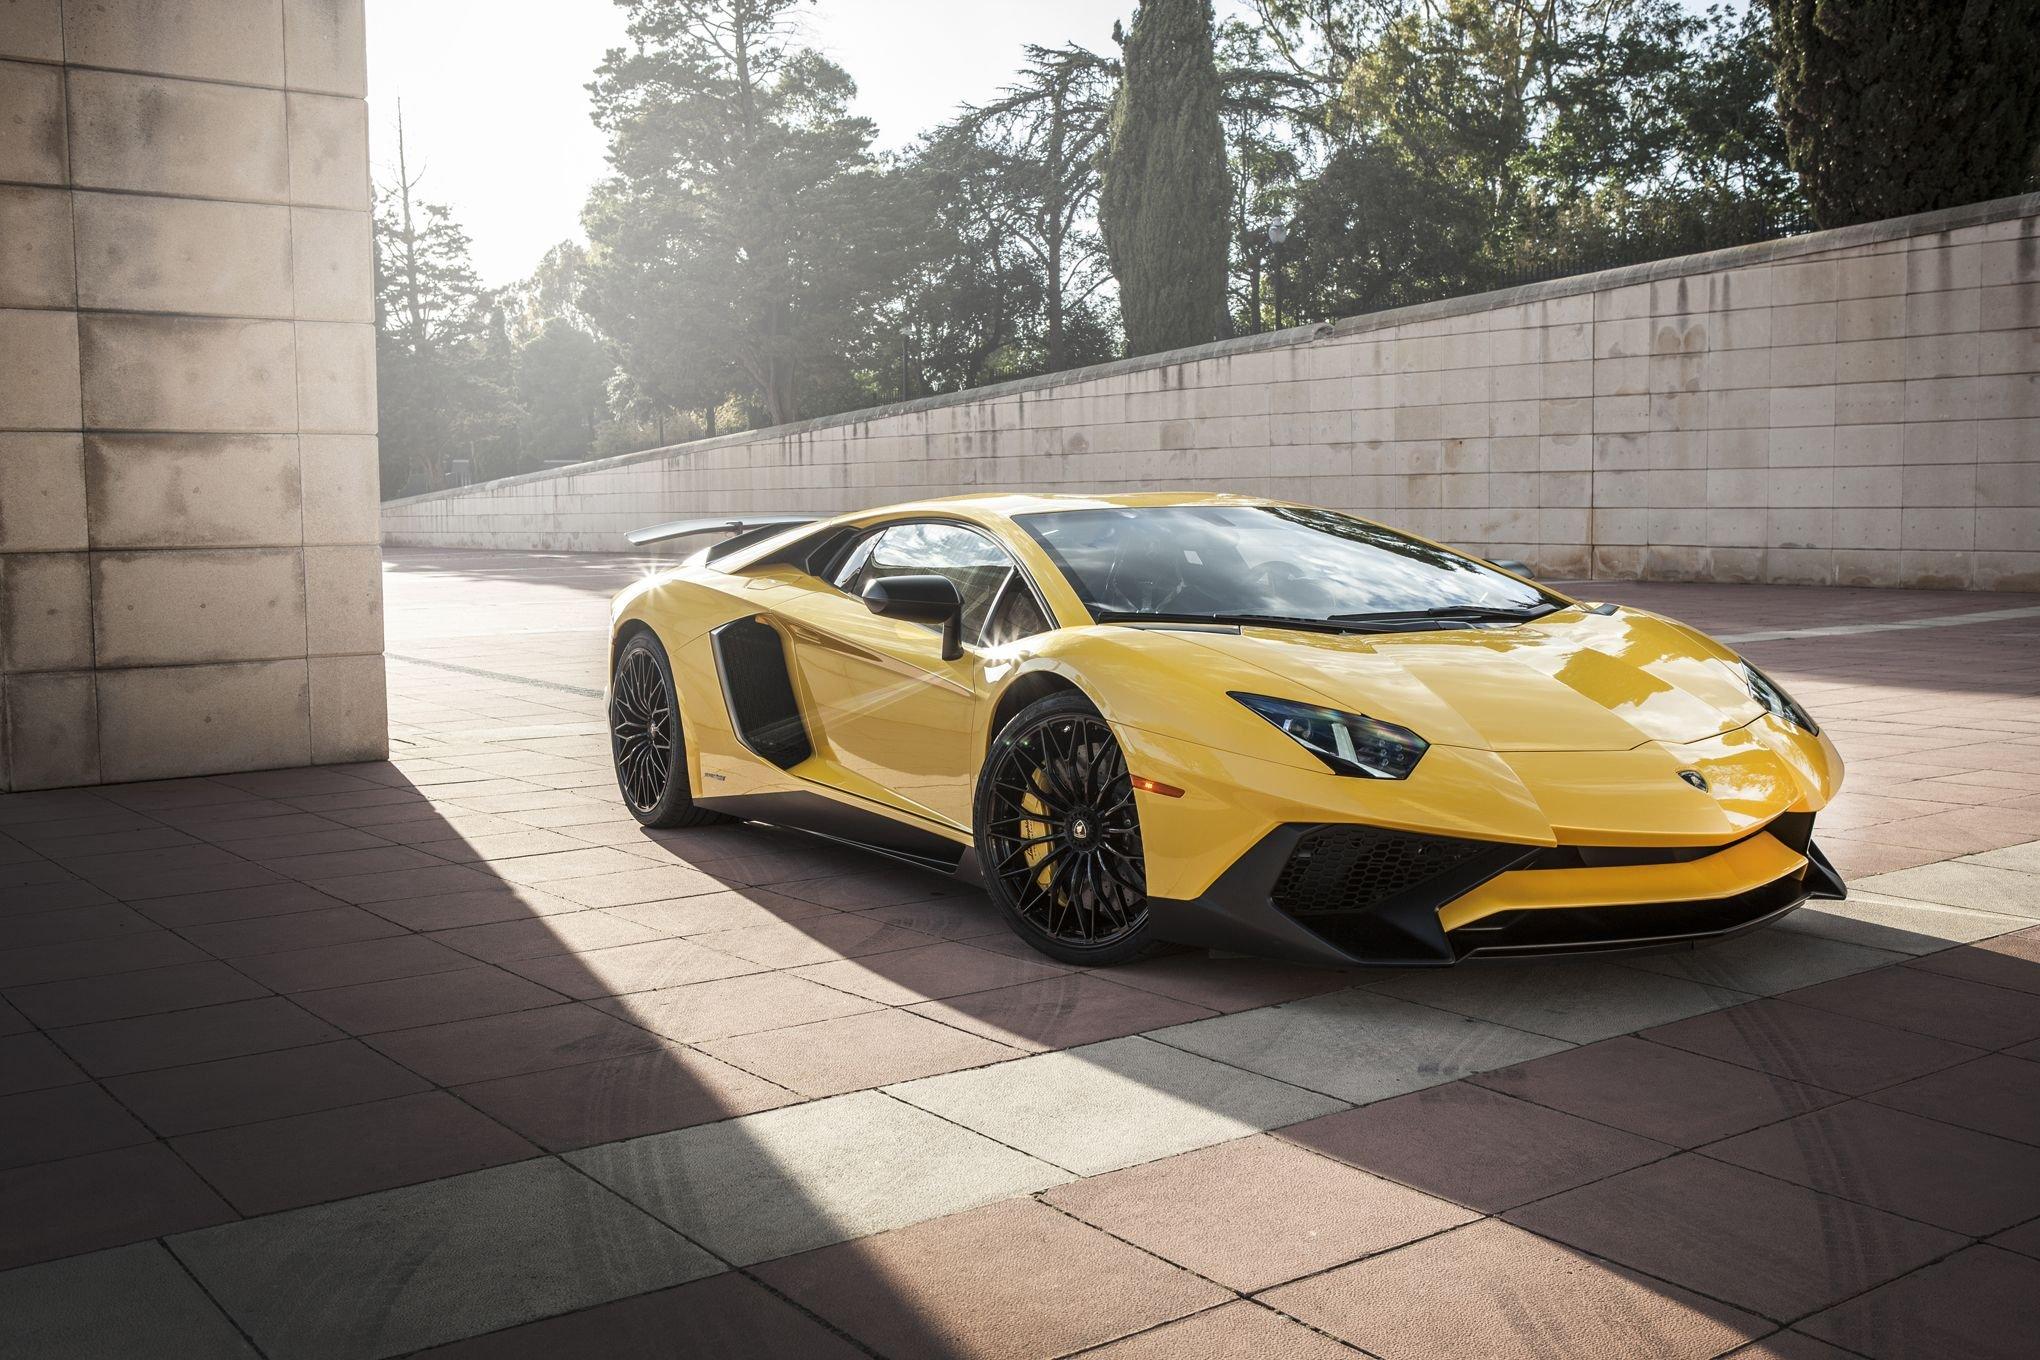 2016 Aventador cars Lamborghini LP7504 supercars CARS superveloce